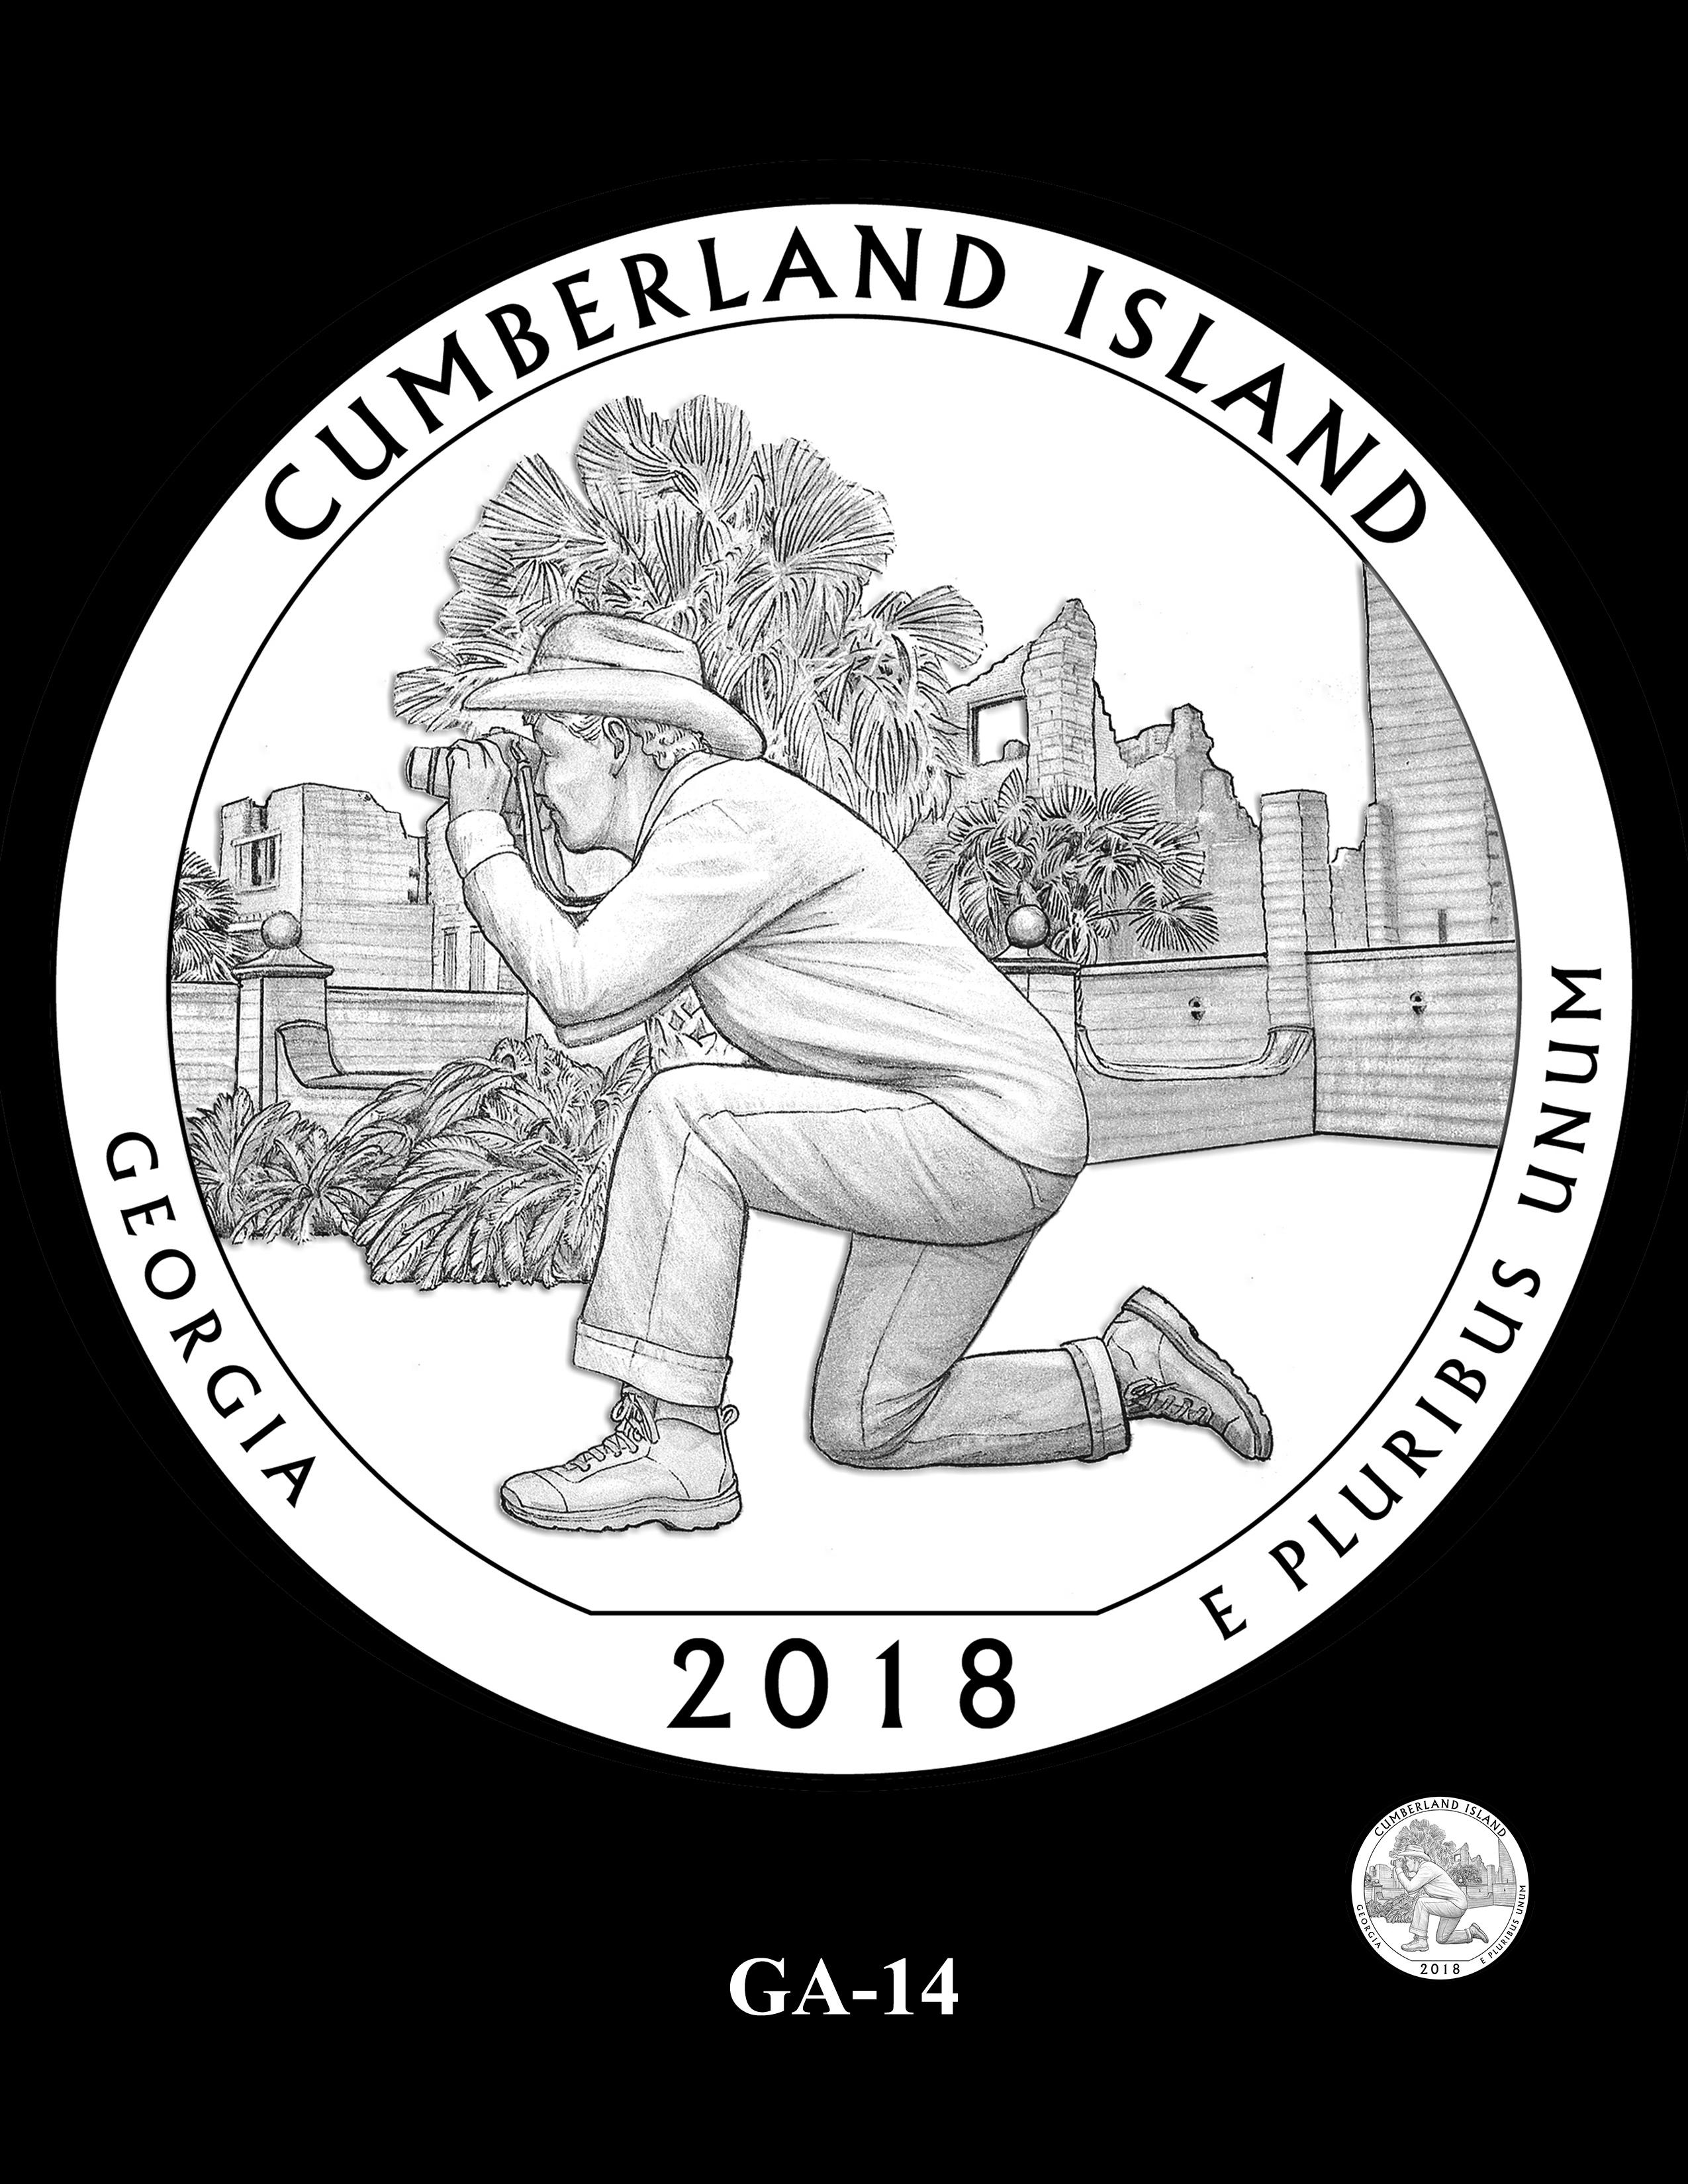 GA-14 -- 2018 America the Beautiful® Quarters Program